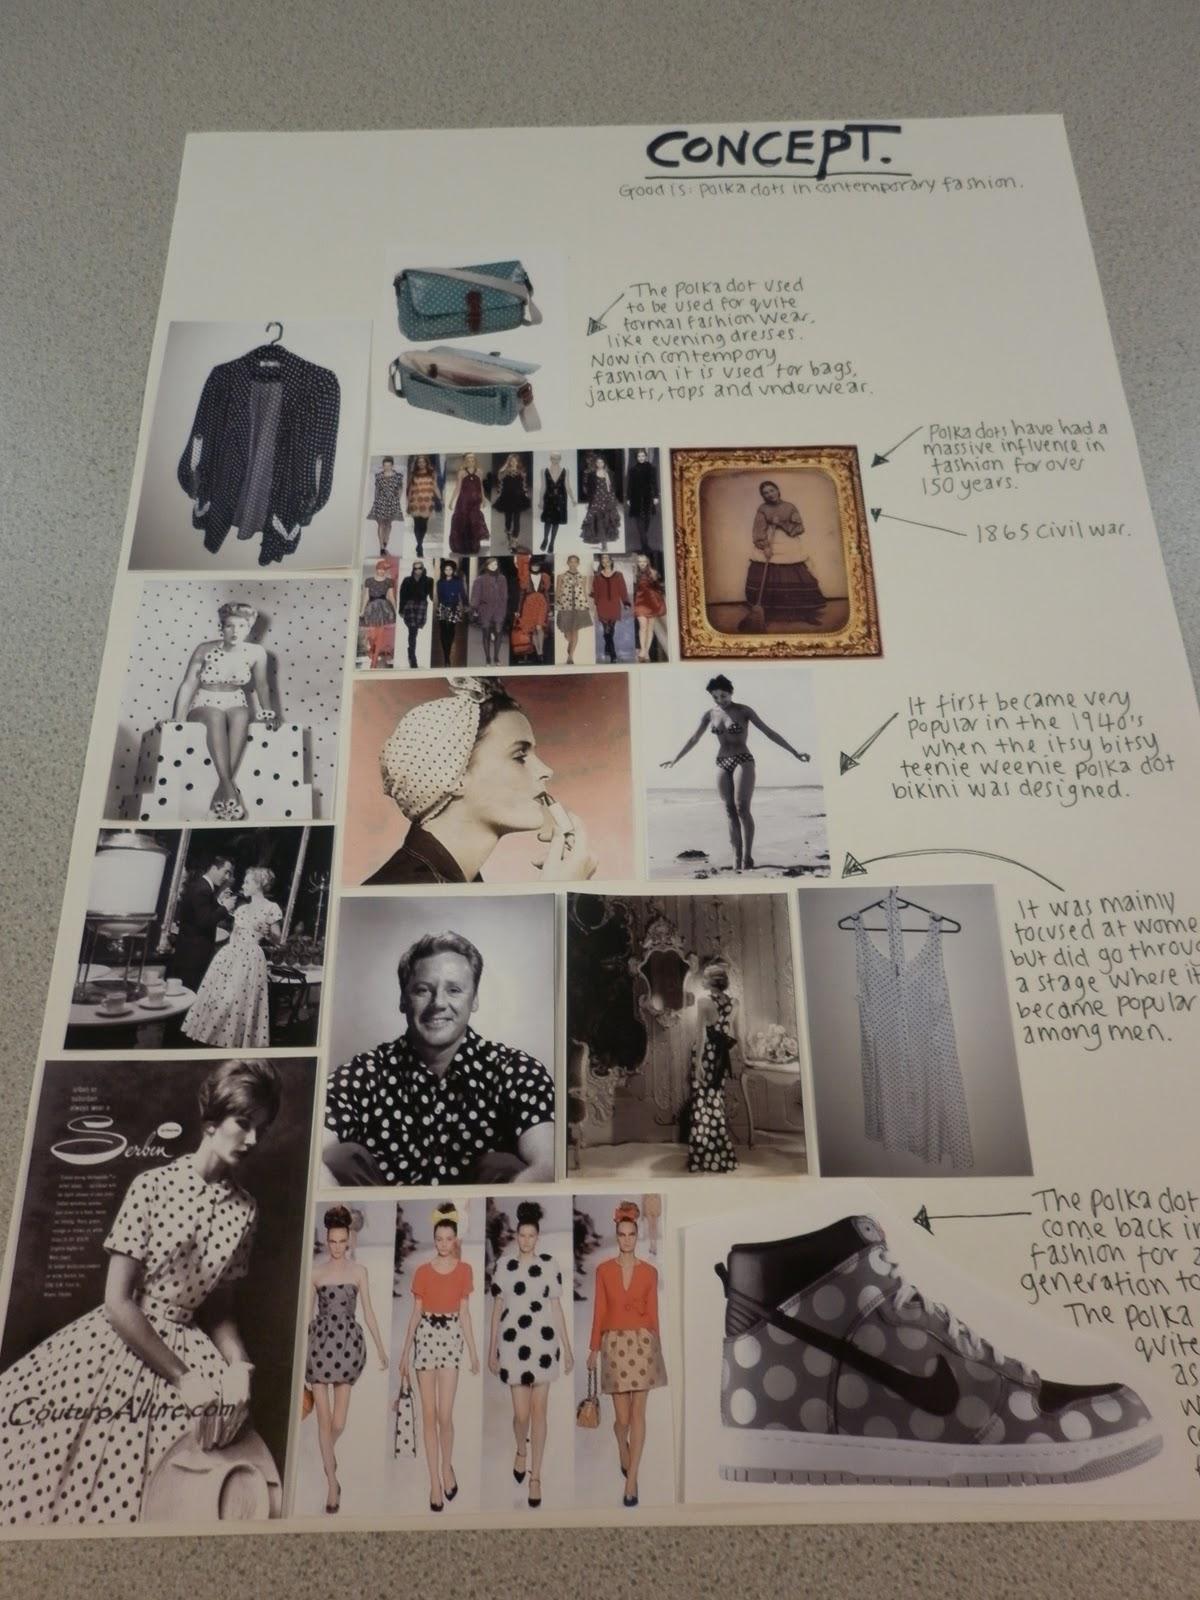 Design Practice Design For Print Concept Boards